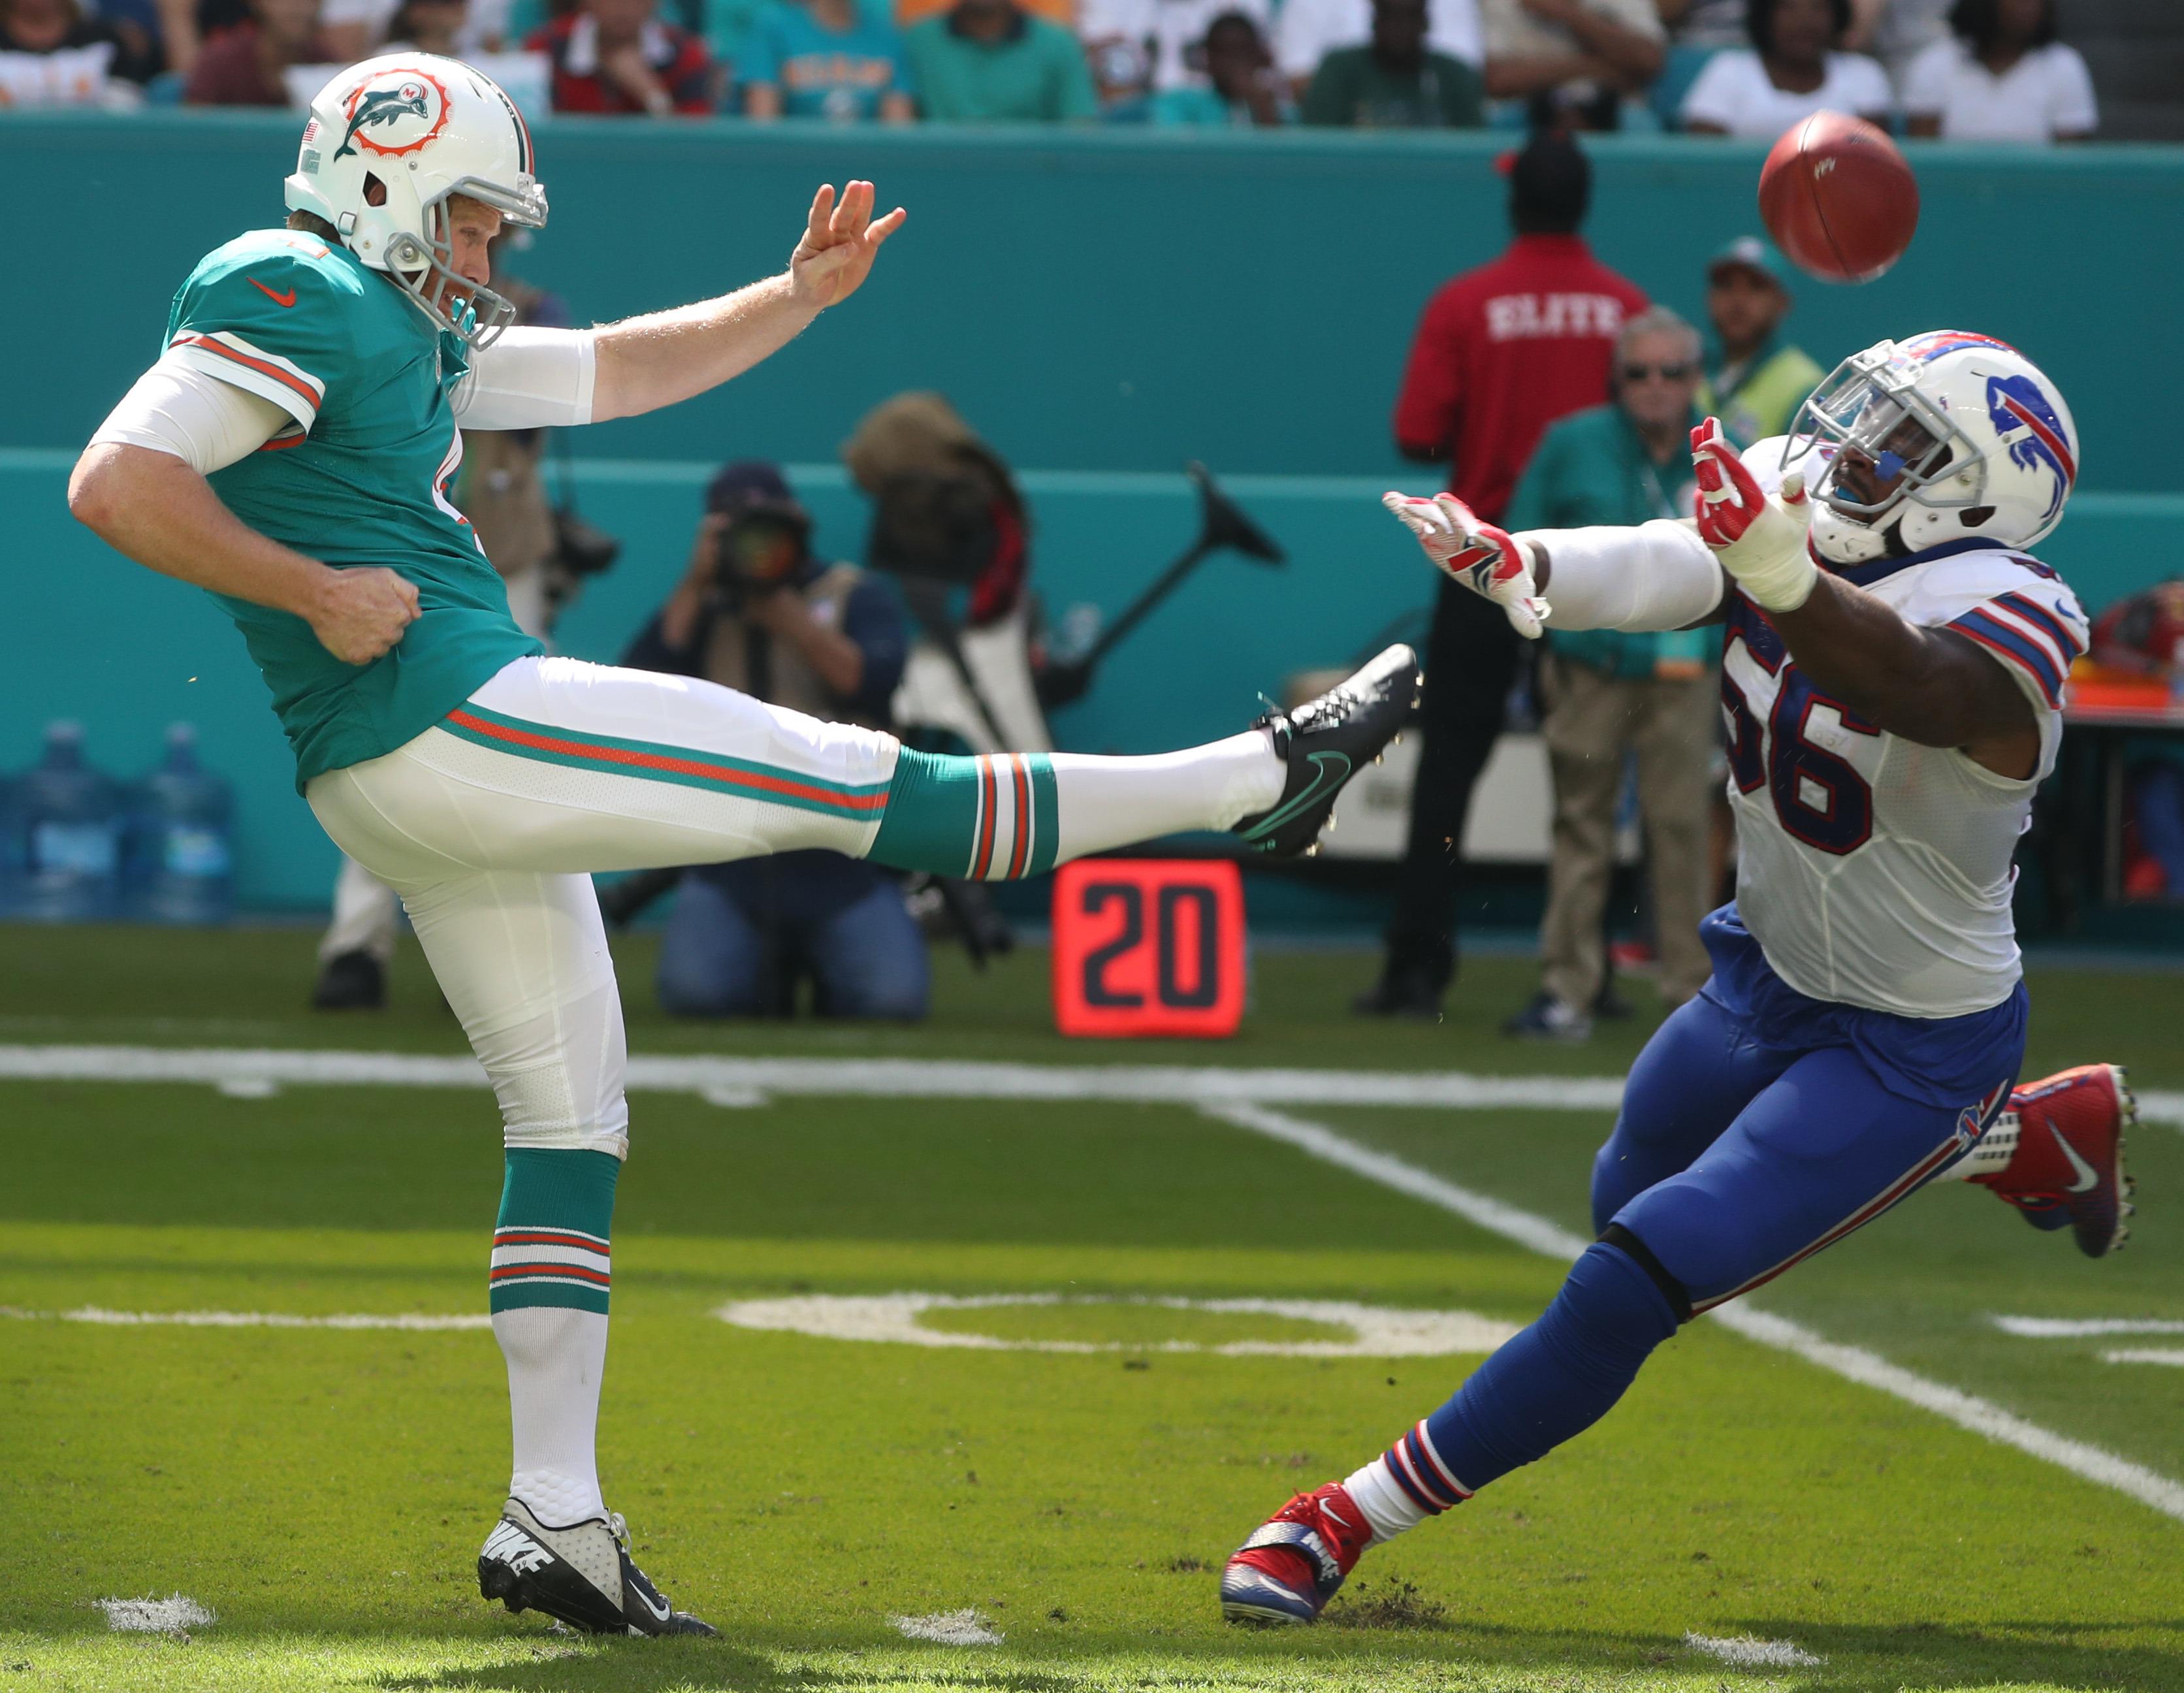 Buffalo Bills linebacker Lerentee McCray blocks the punt of Miami Dolphins punter Matt Darr in the second quarter. (James P. McCoy/Buffalo News)